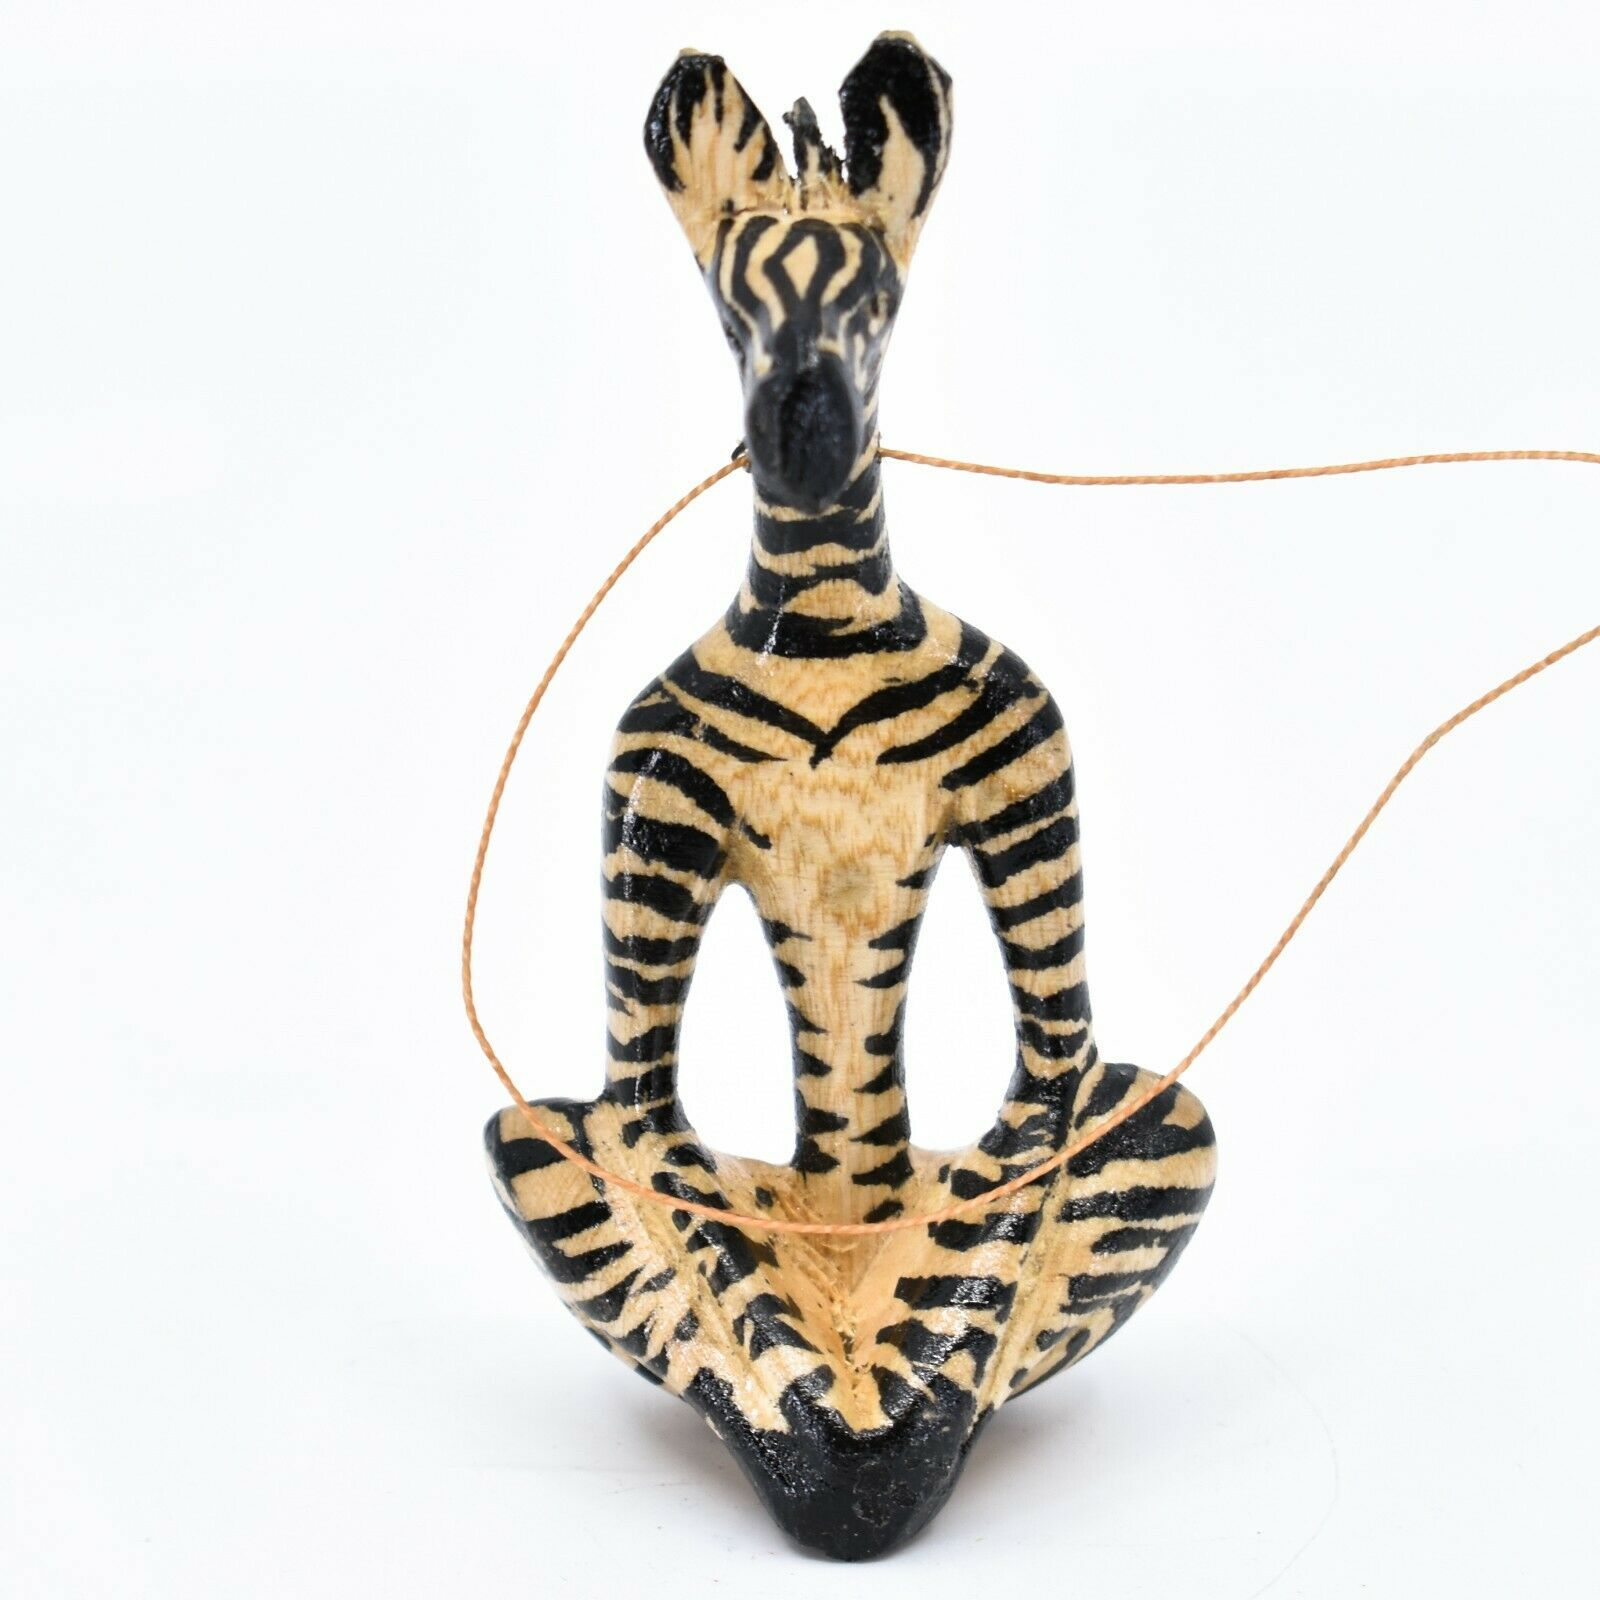 Hand Carved Painted Jacaranda Wood Yoga Lotus Pose Zebra Christmas Ornament